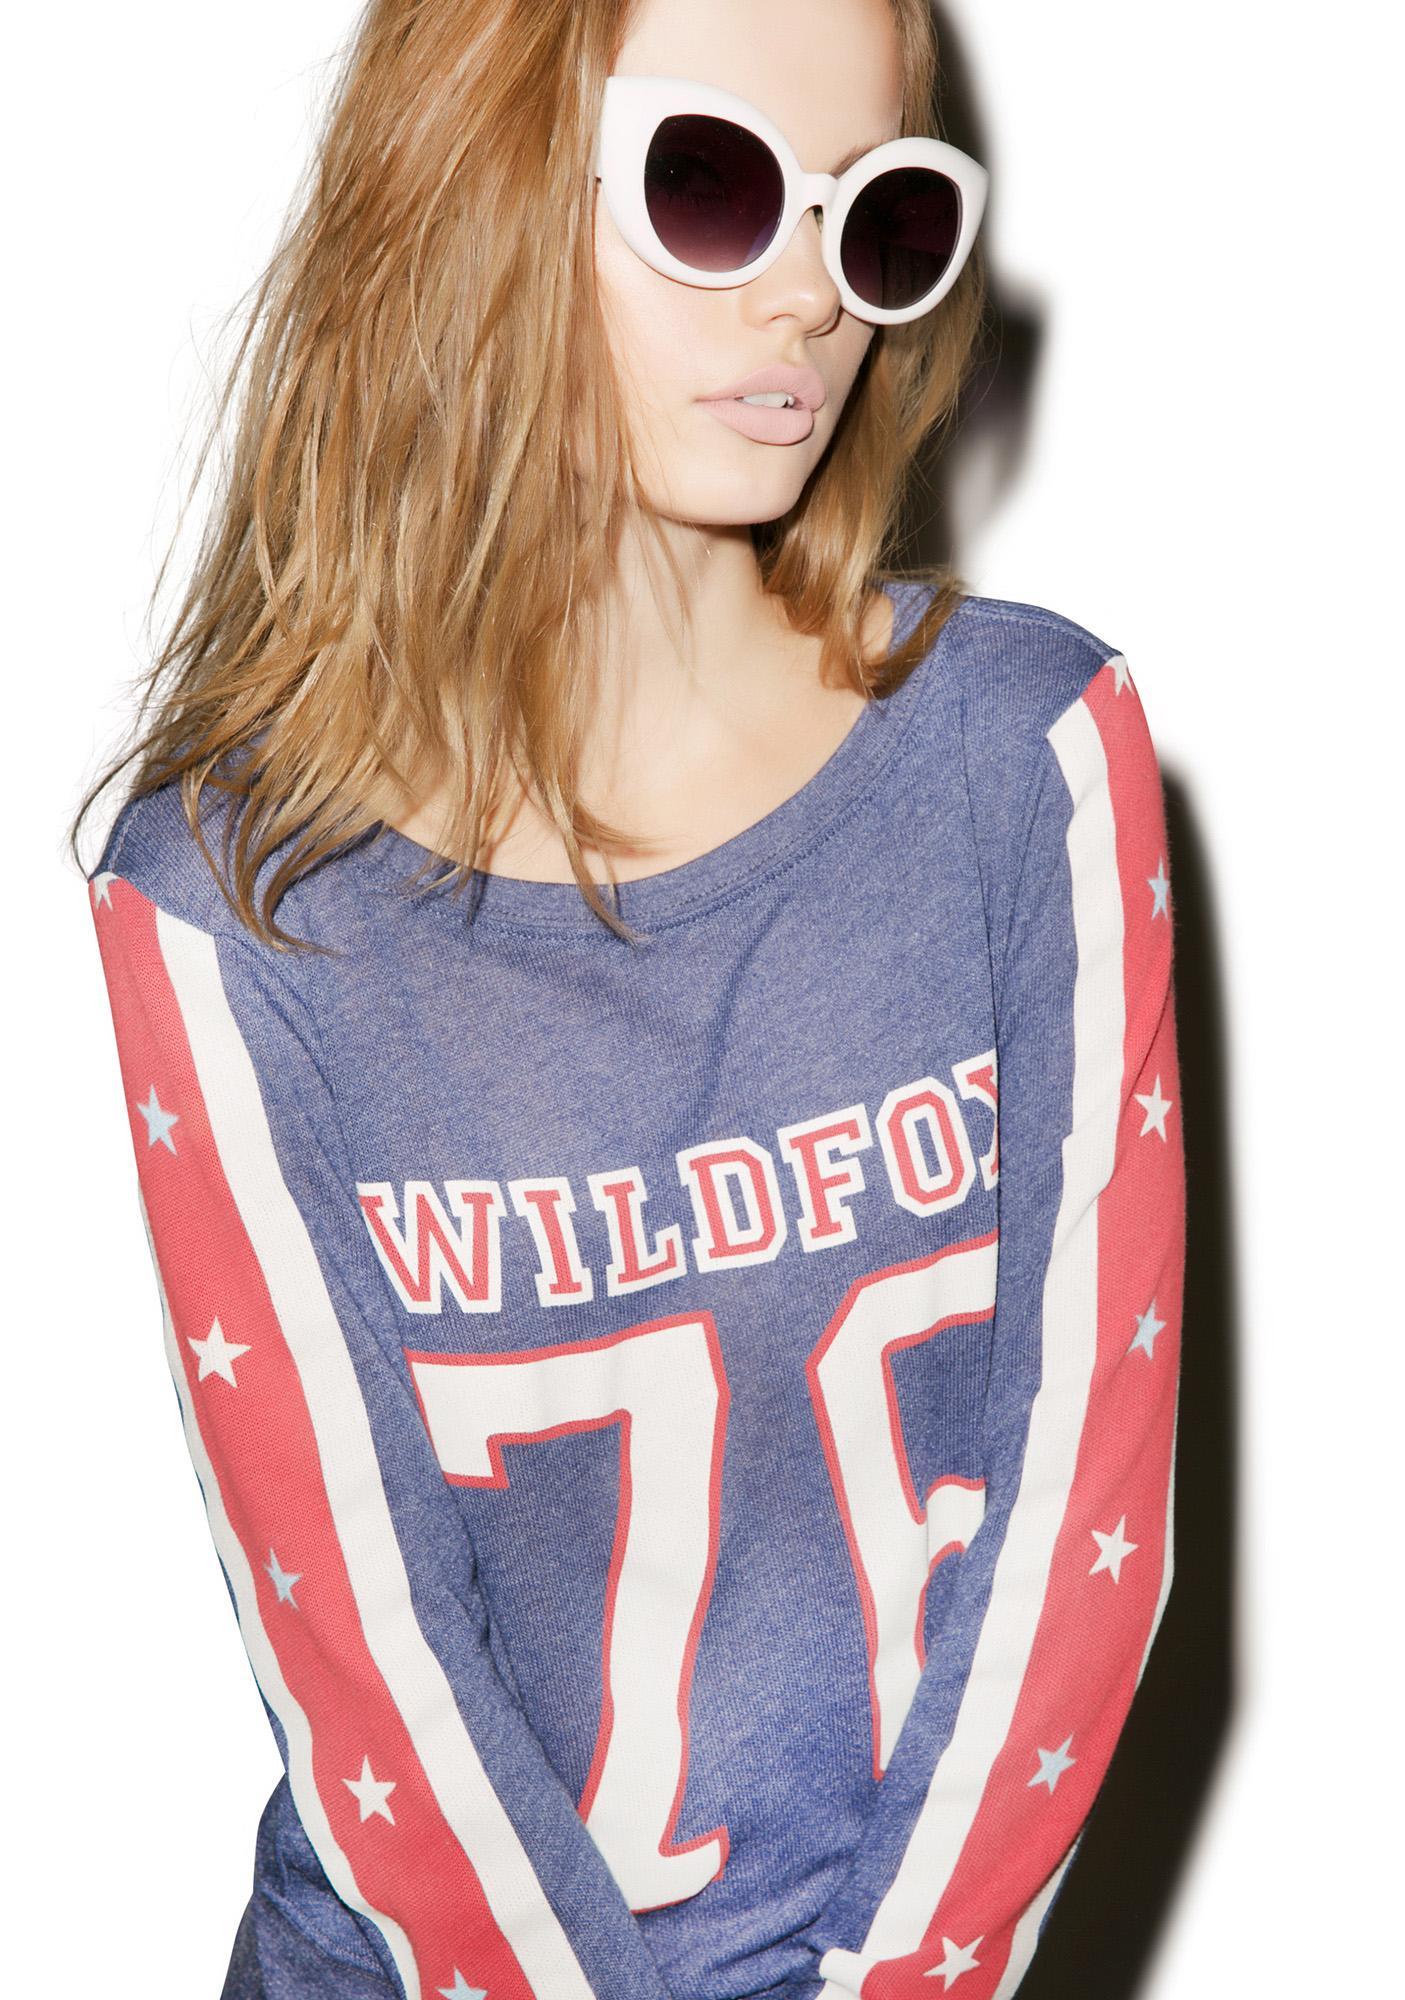 Wildfox Couture Est. 1776 Baggy Summer Jumper